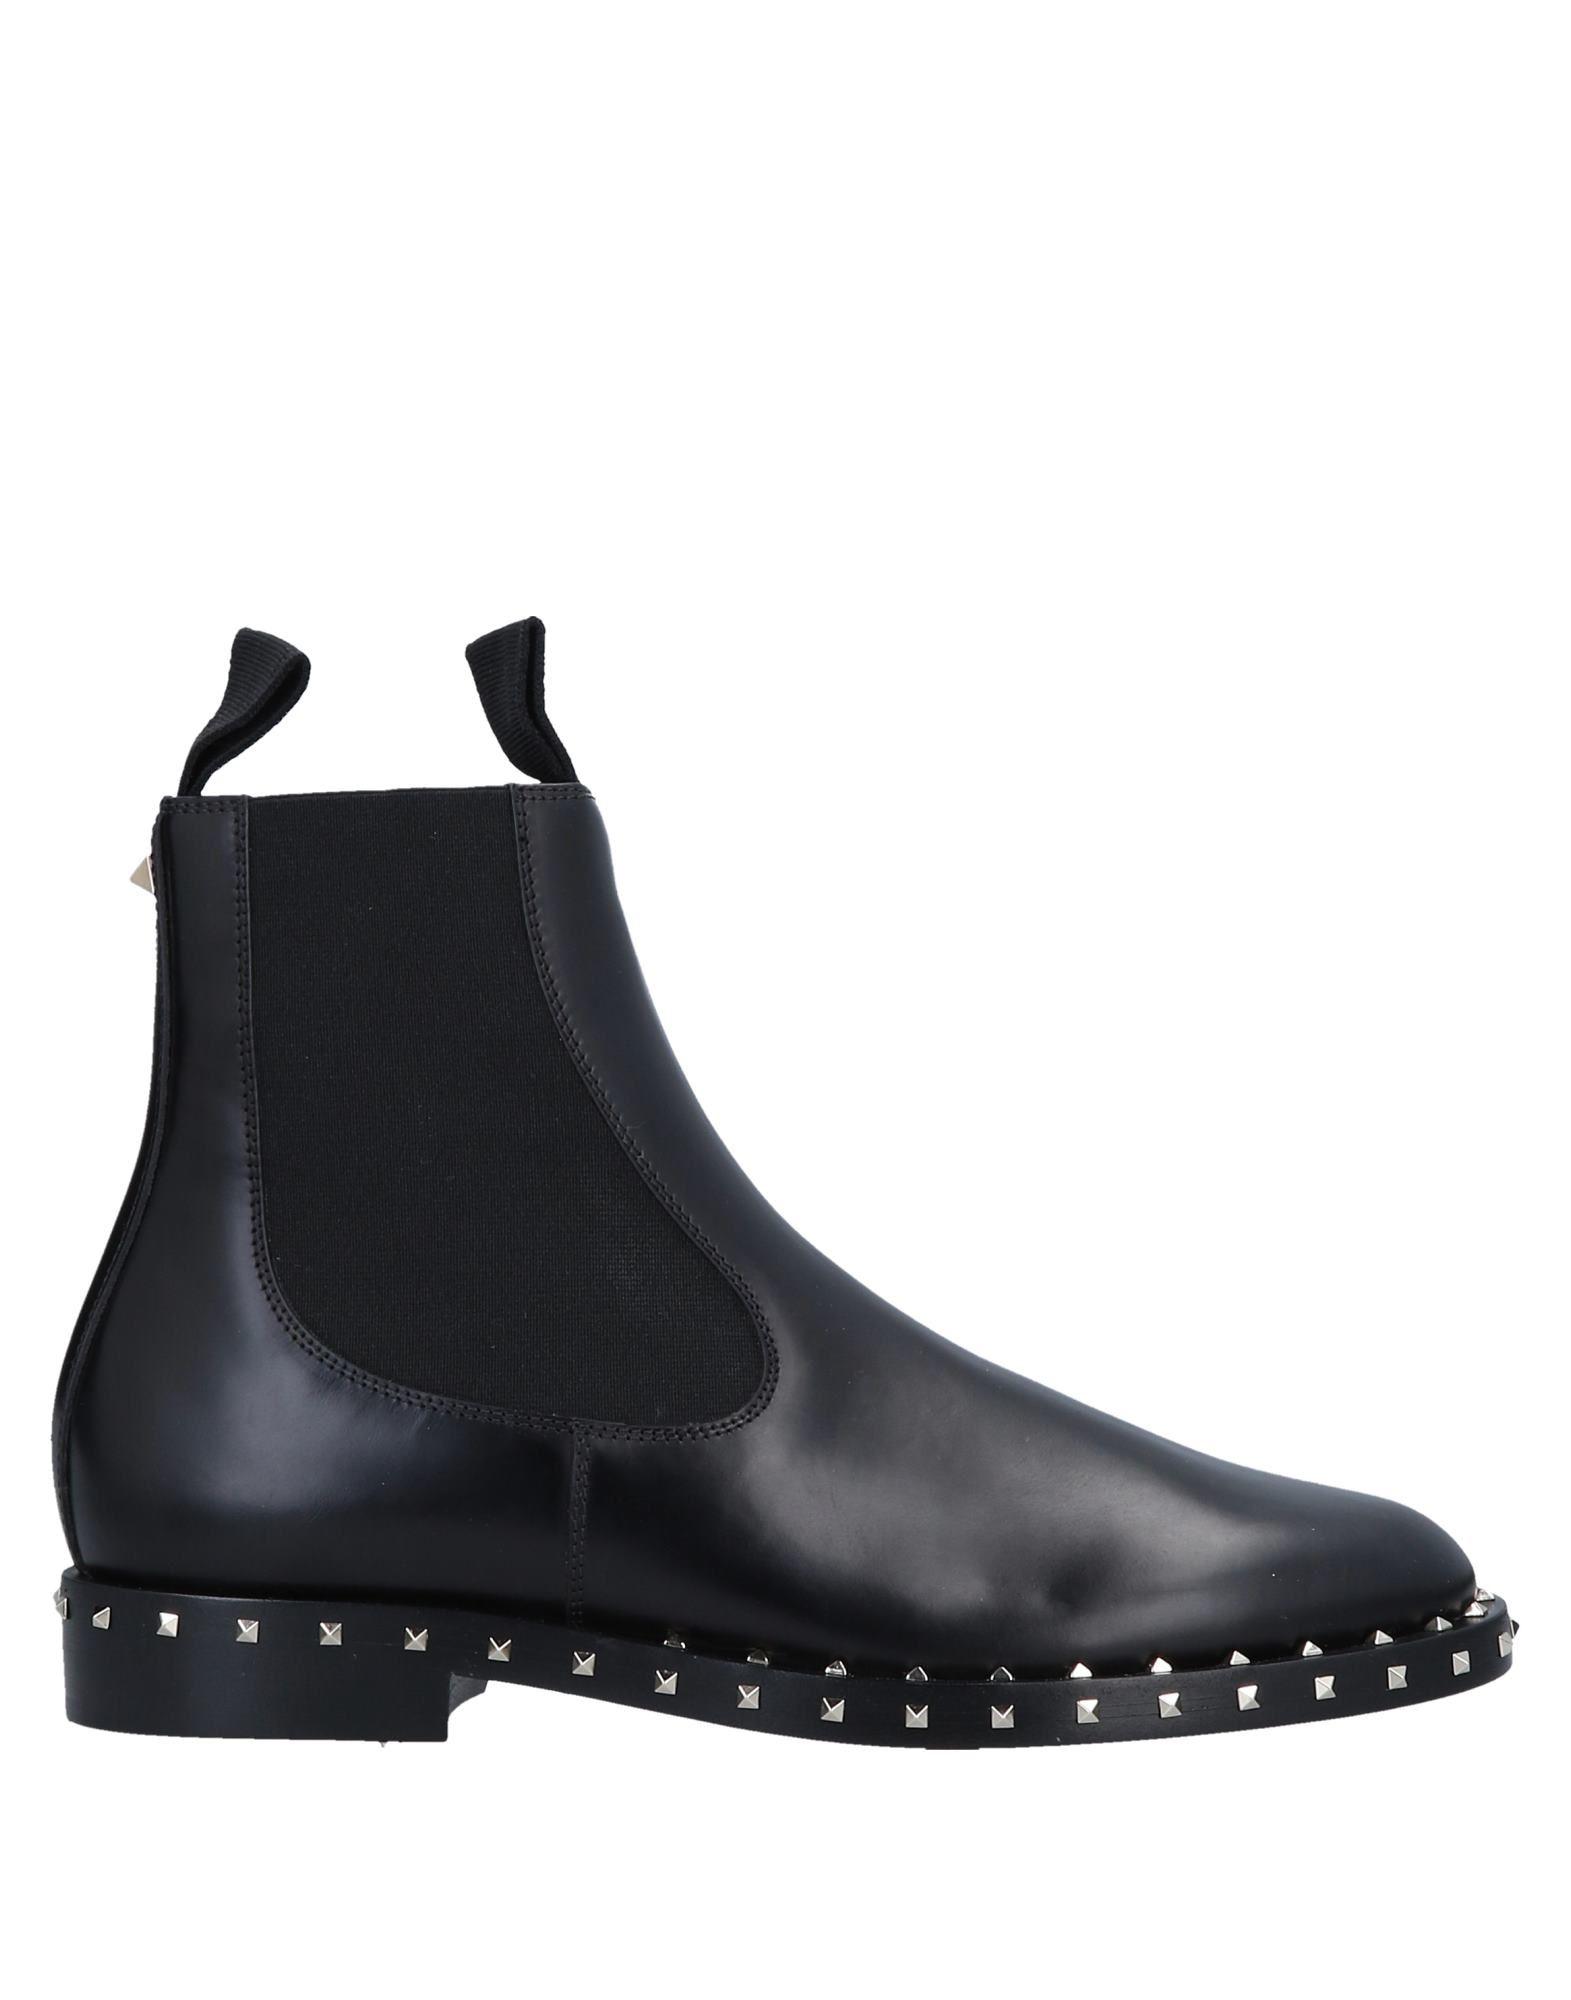 Valentino Garavani Ankle Boot - Women Valentino on Garavani Ankle Boots online on Valentino  Australia - 11573156VN eb1006